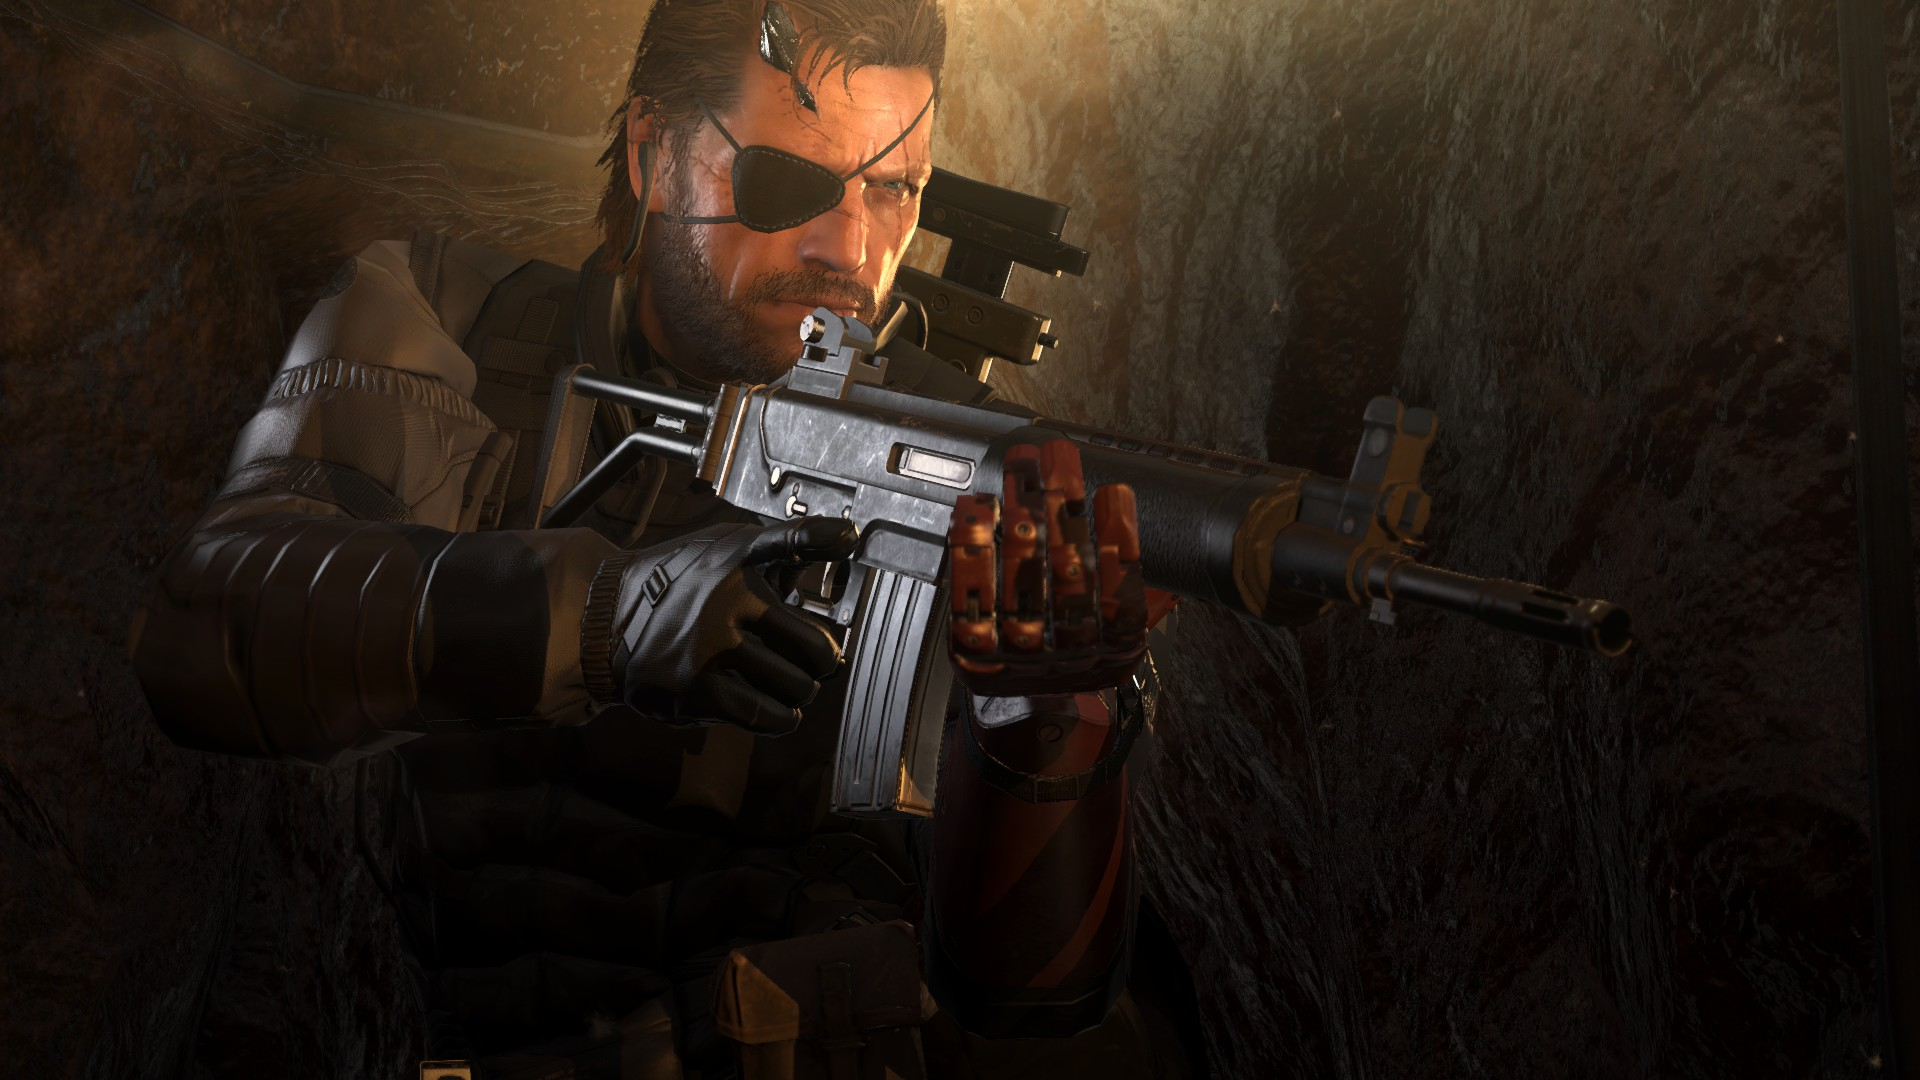 загруженное (9).jpg - Metal Gear Solid 5: The Phantom Pain